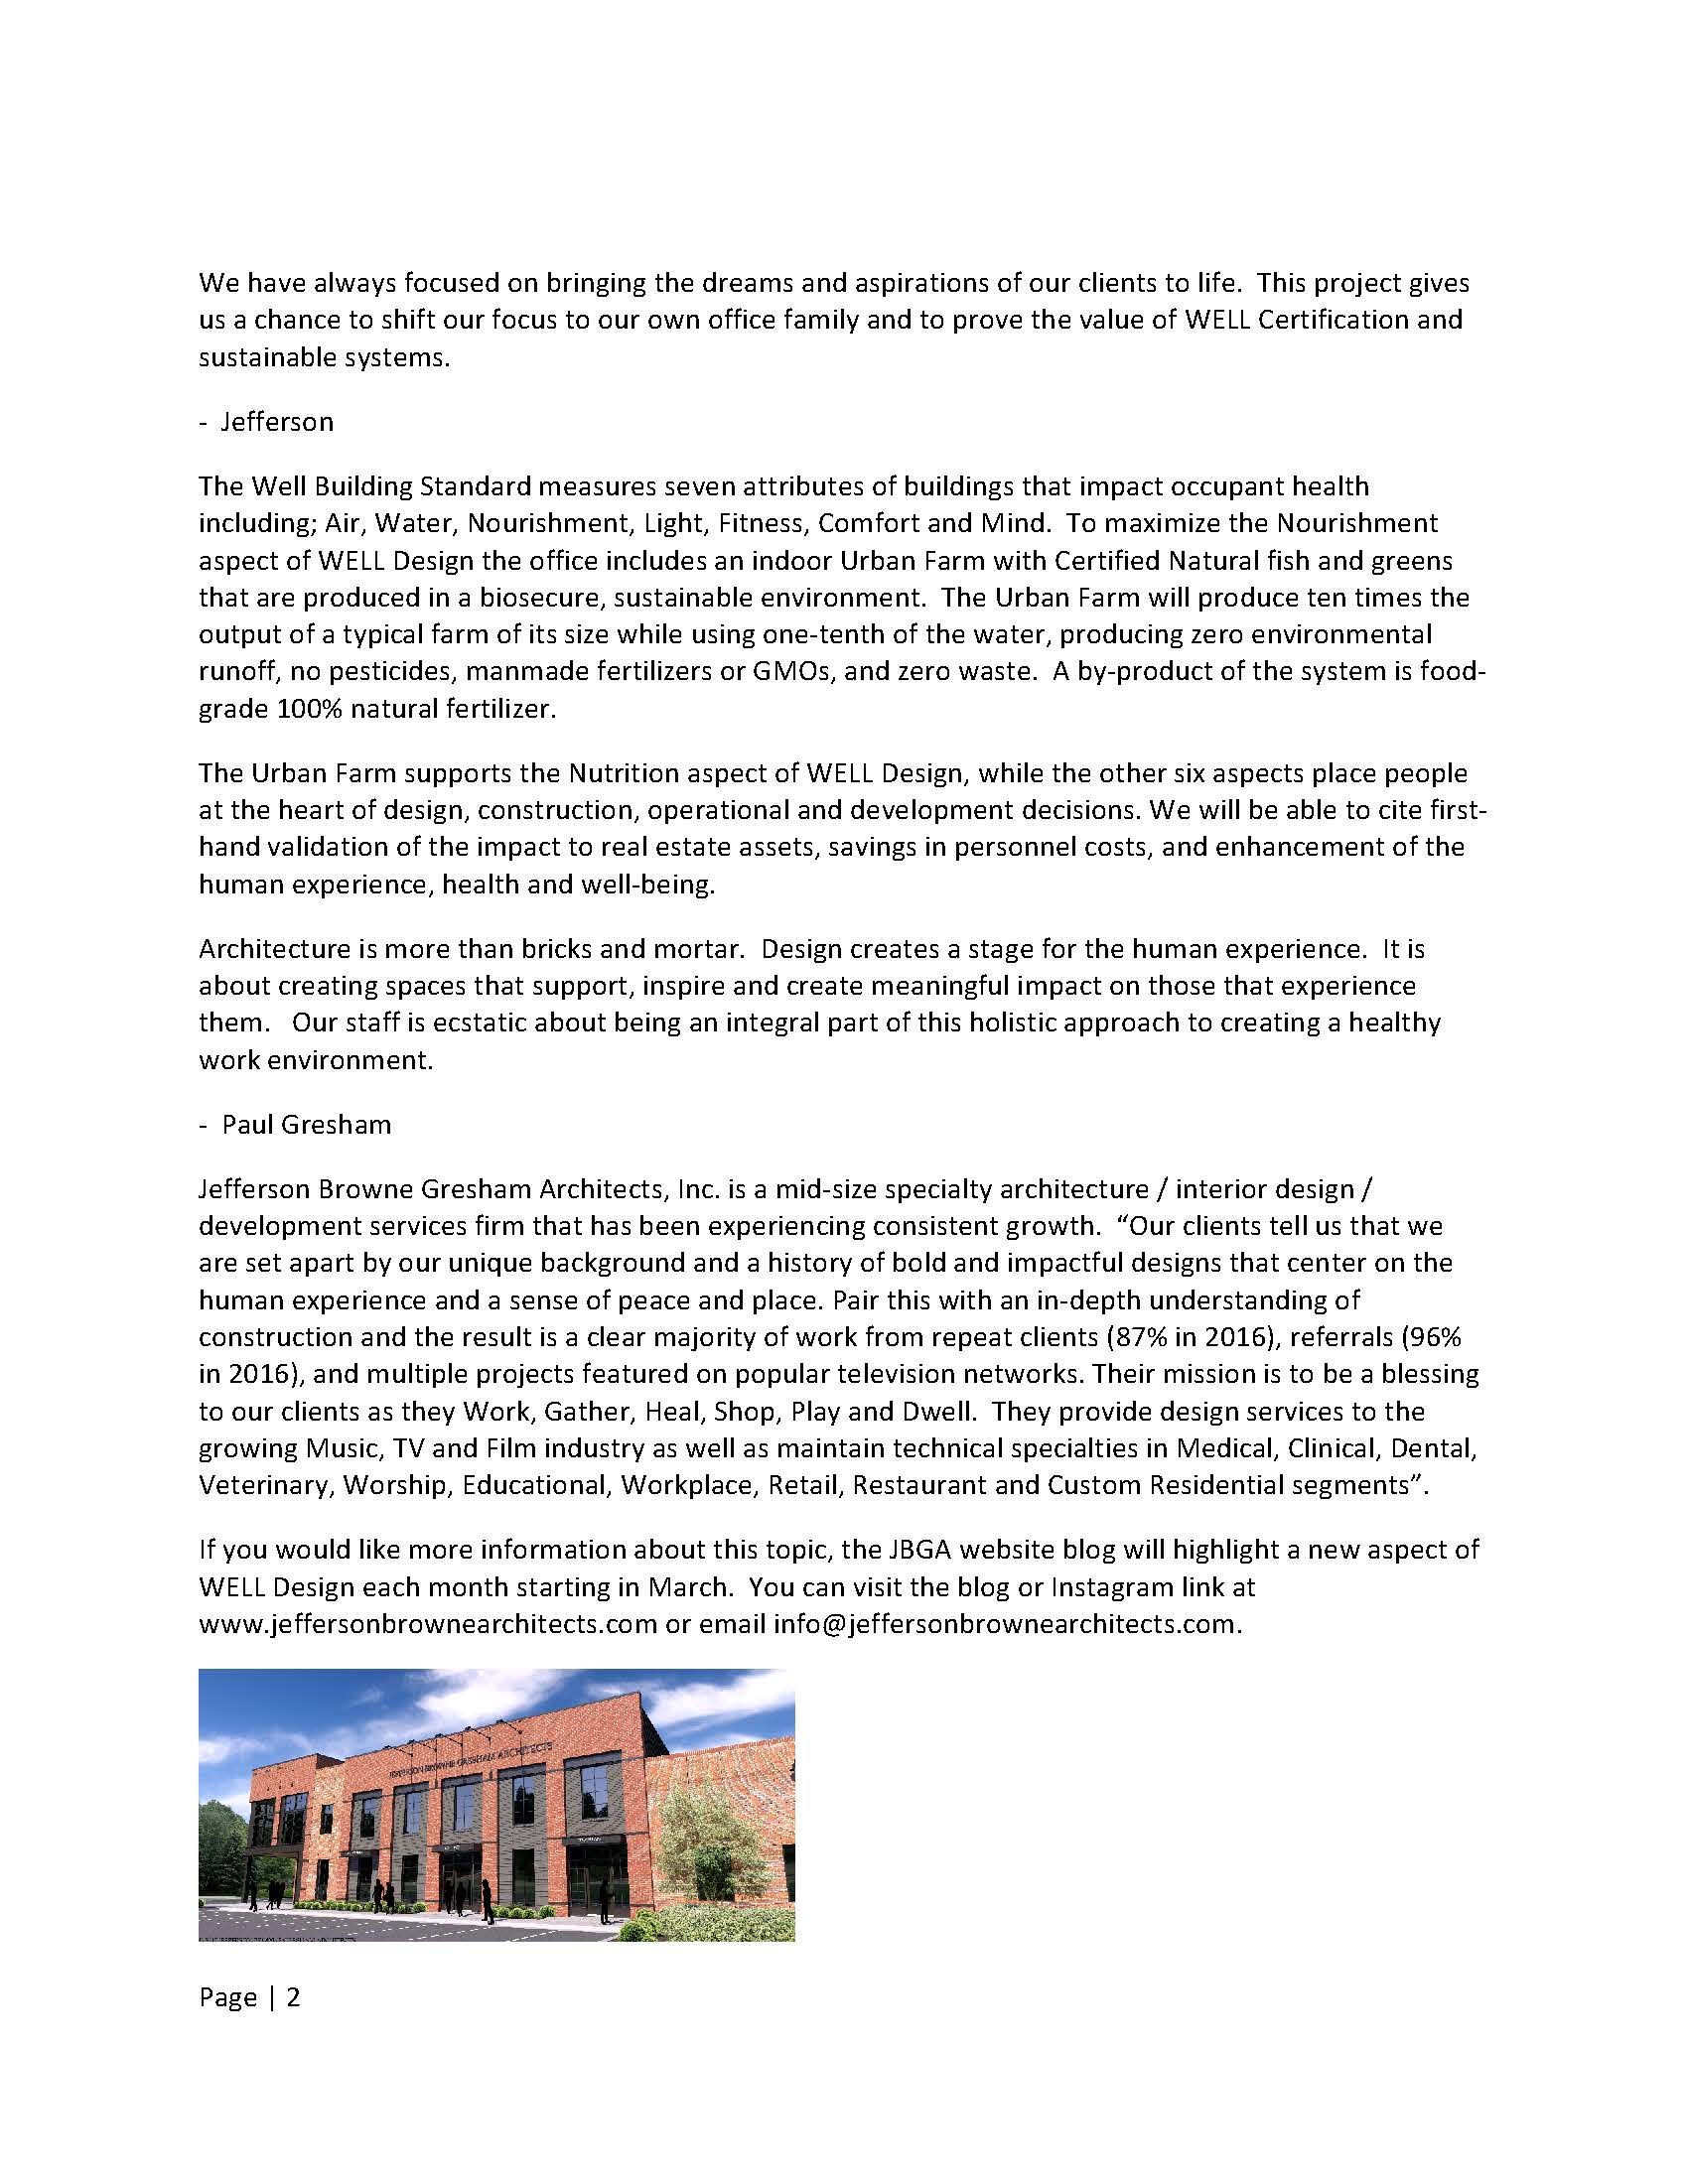 20170130 PRESS RELEASE JBGA - WELL BUILDING_Page_2.jpg